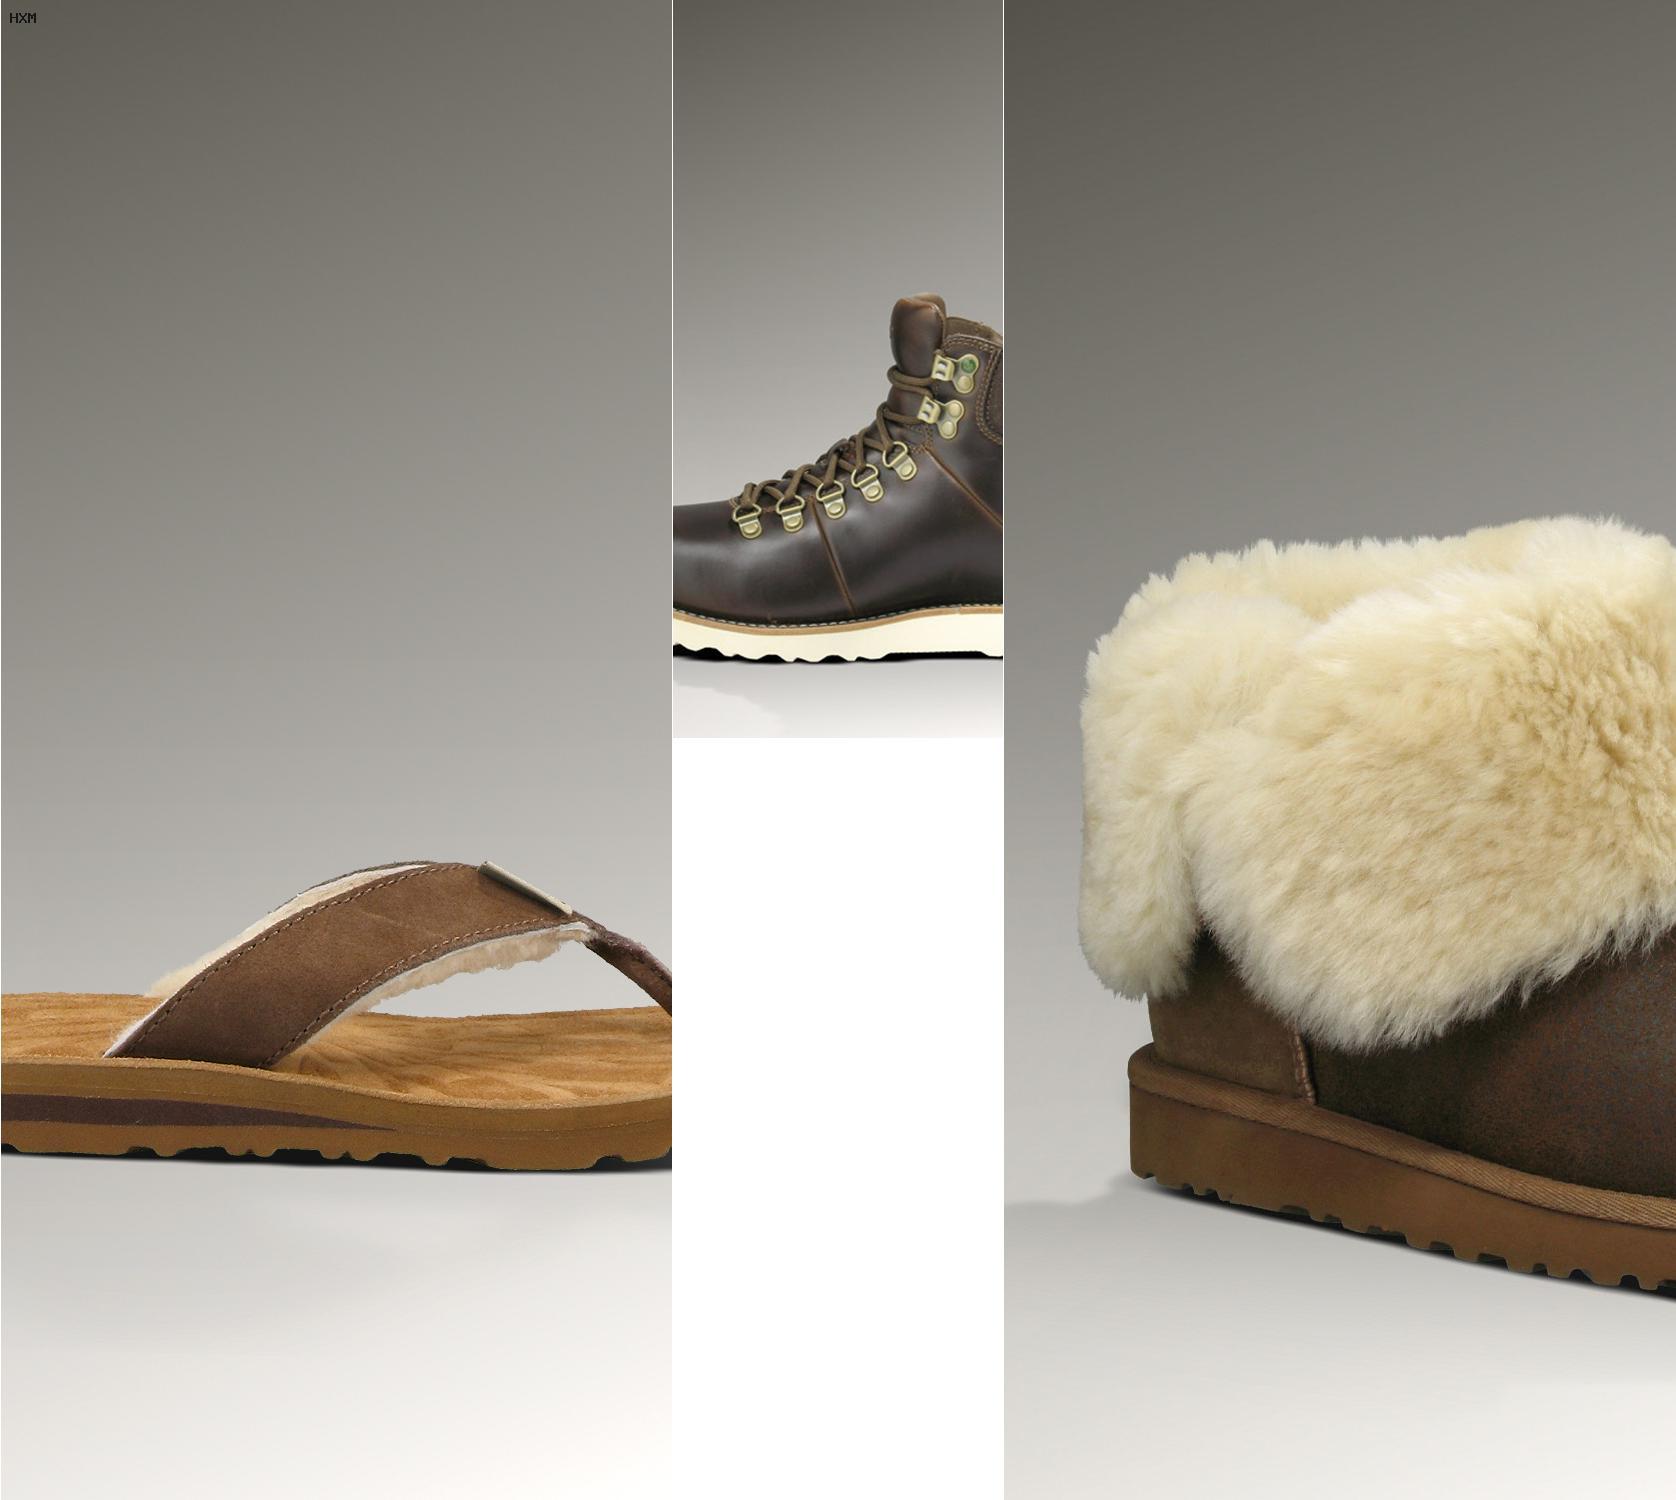 costco ugg like boots